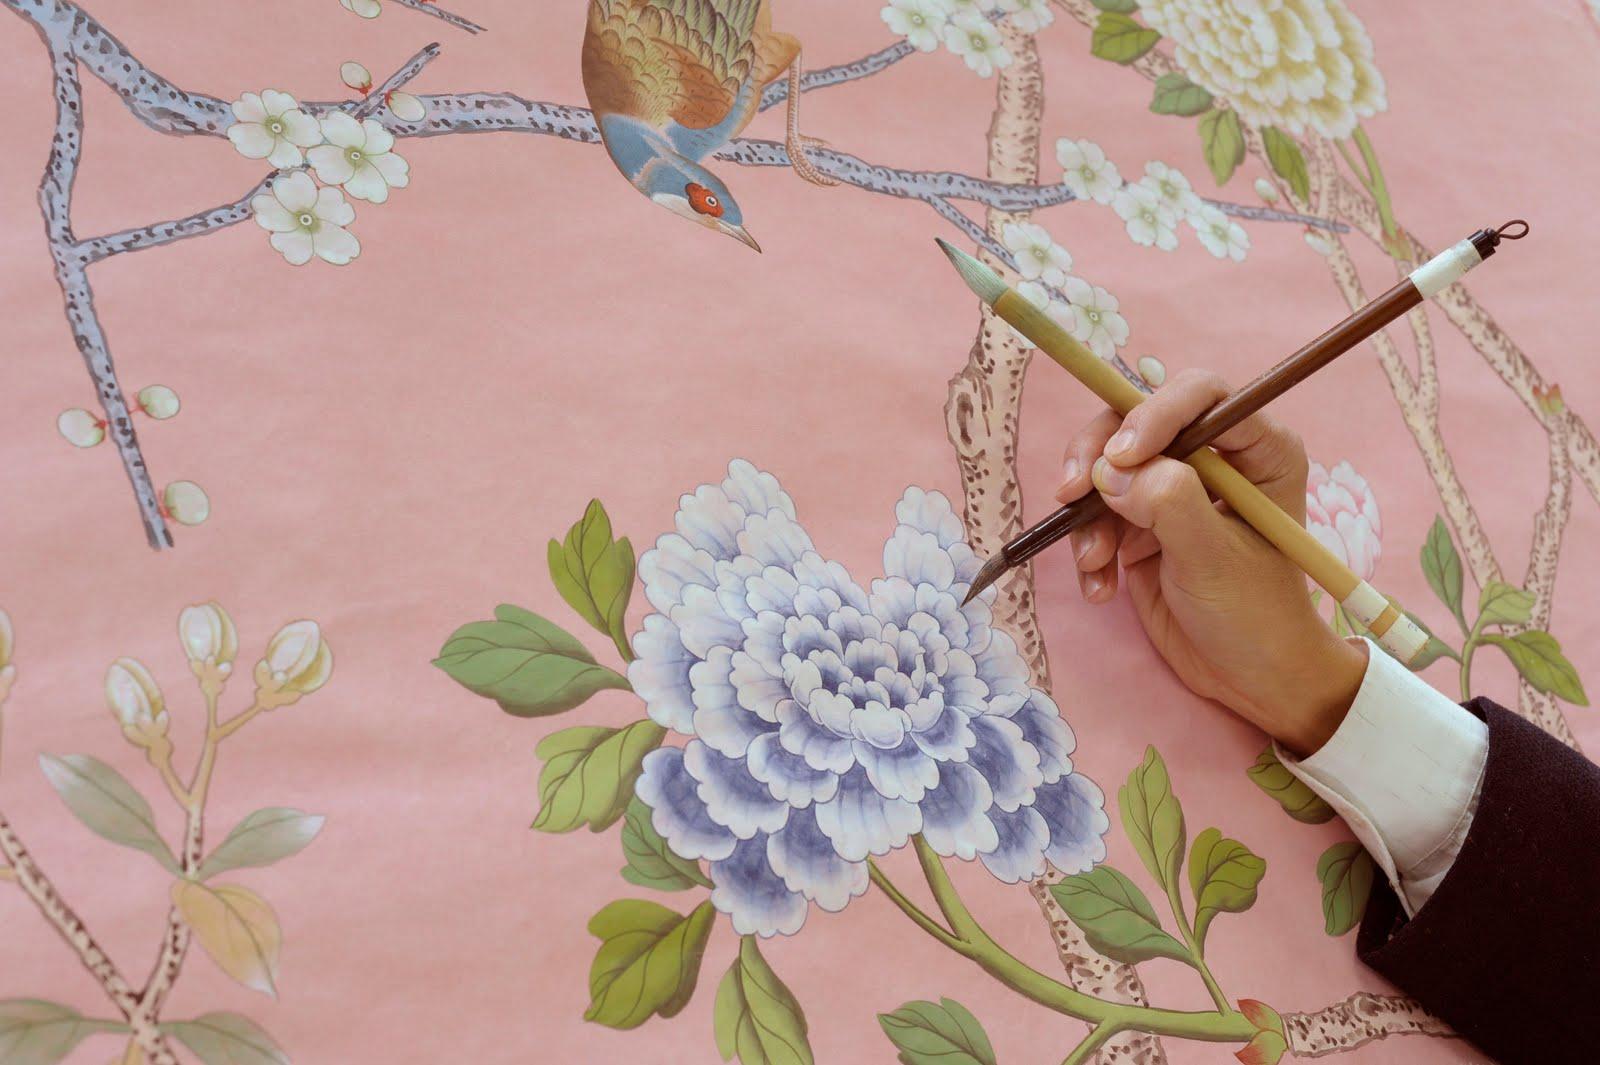 An artisan hand-painting a de Gournay panel